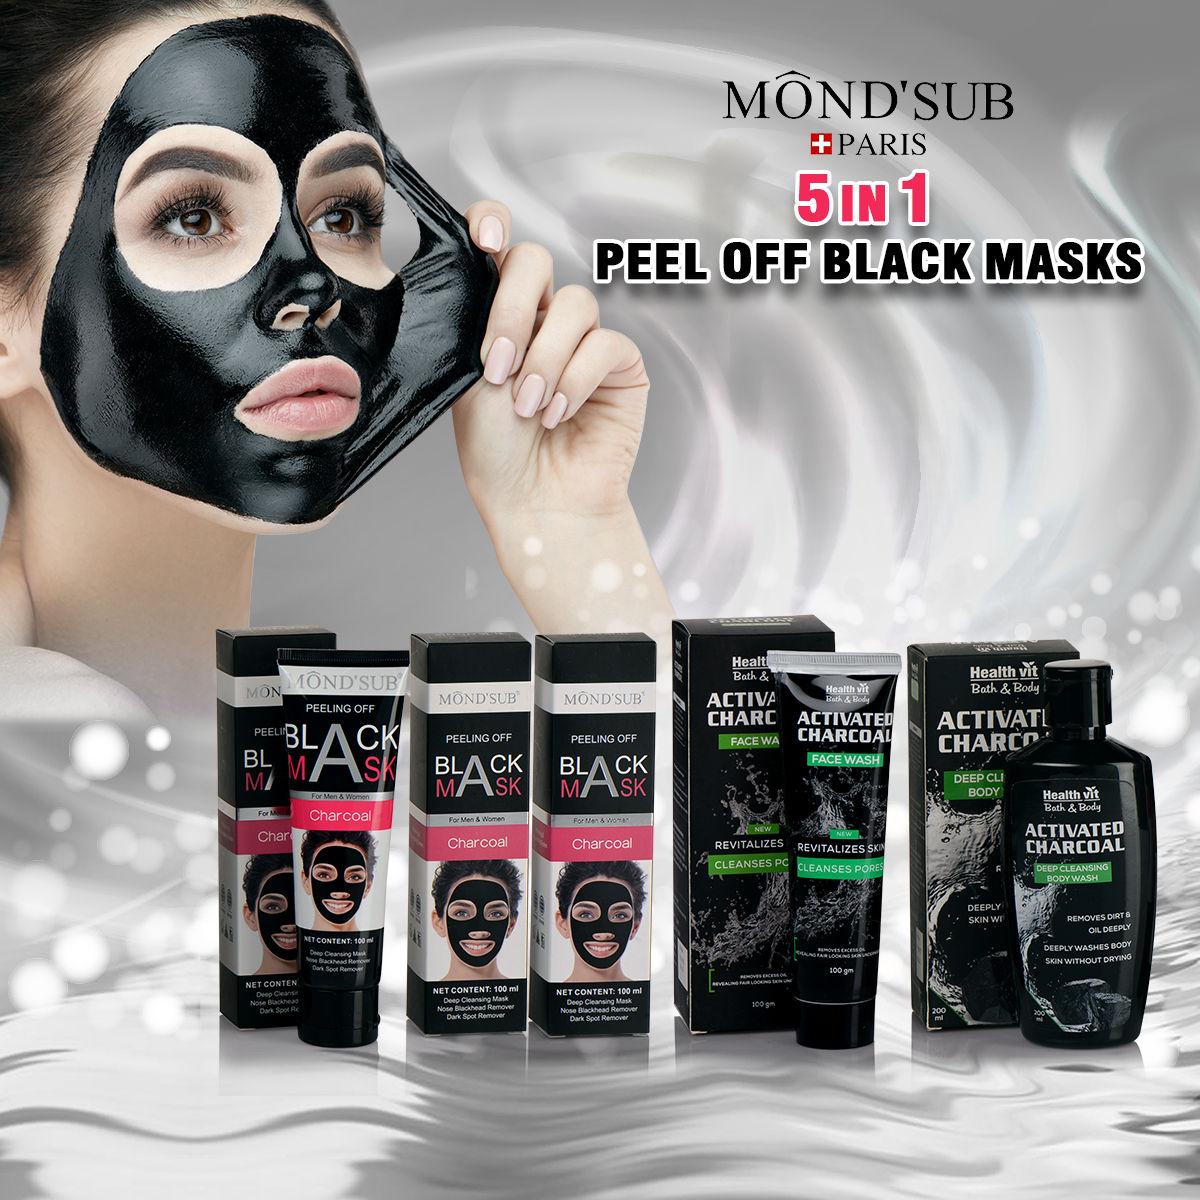 c4816a35b0 Buy MondSub Paris 5 in 1 Peel Off Black Masks Online at Best Price in India  on Naaptol.com